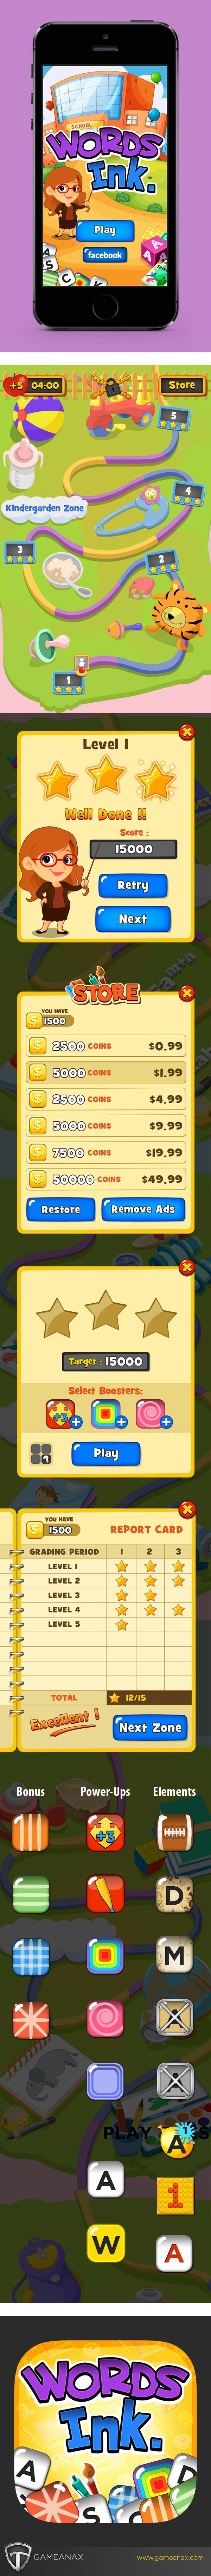 mobile gaming Gaming Games UI iphone iPad puzzle